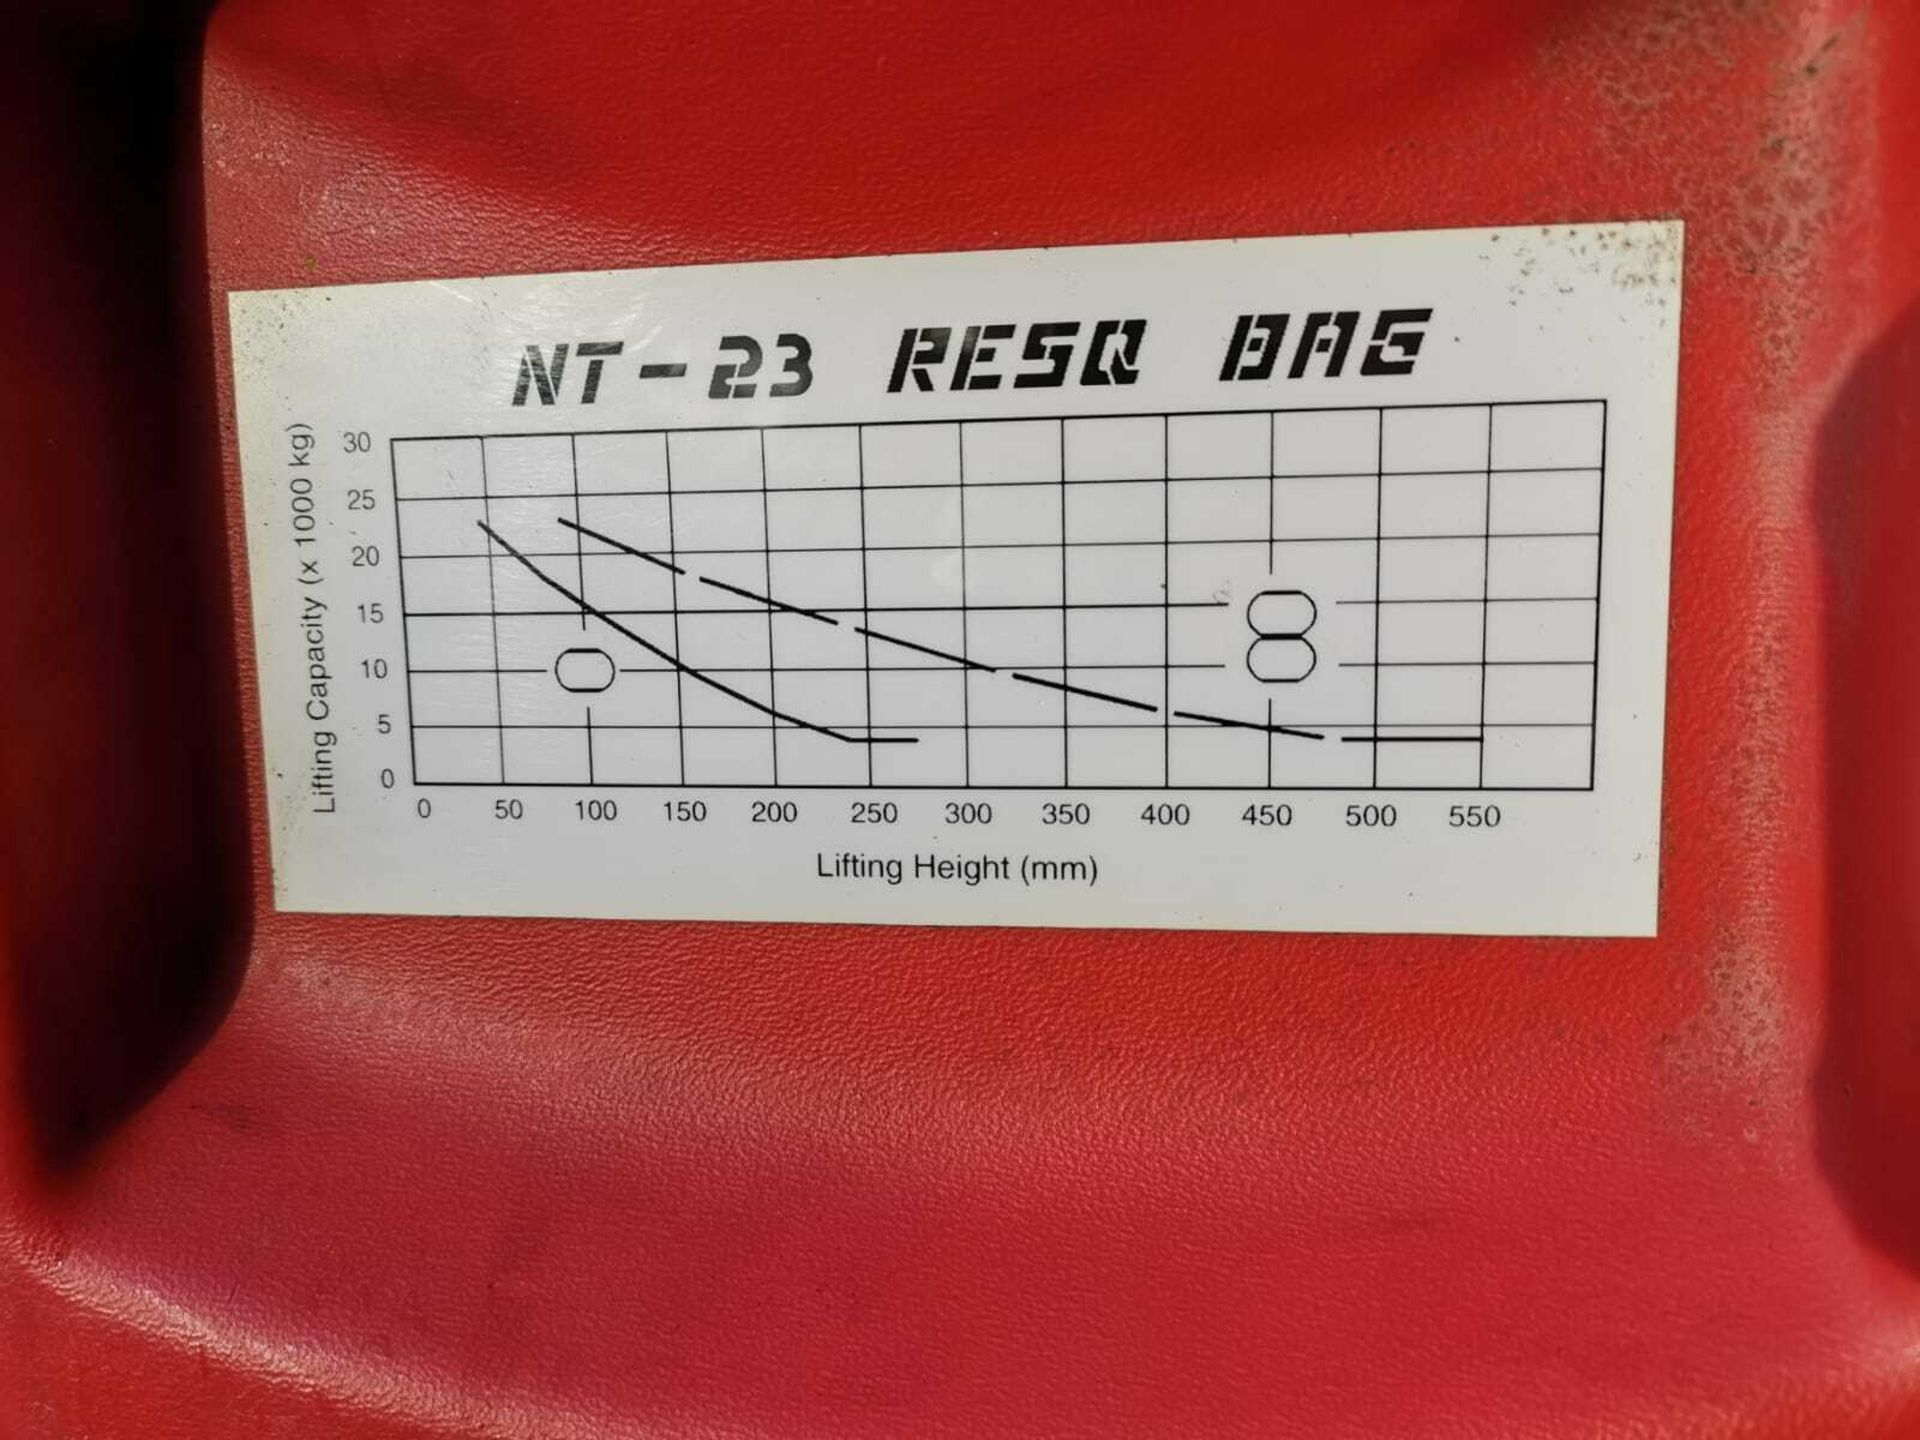 ZUMRO RESQ CASE & RESQ AIR BAGS NT-23, NT-58, NT-132. *PLUS VAT* - Image 6 of 7